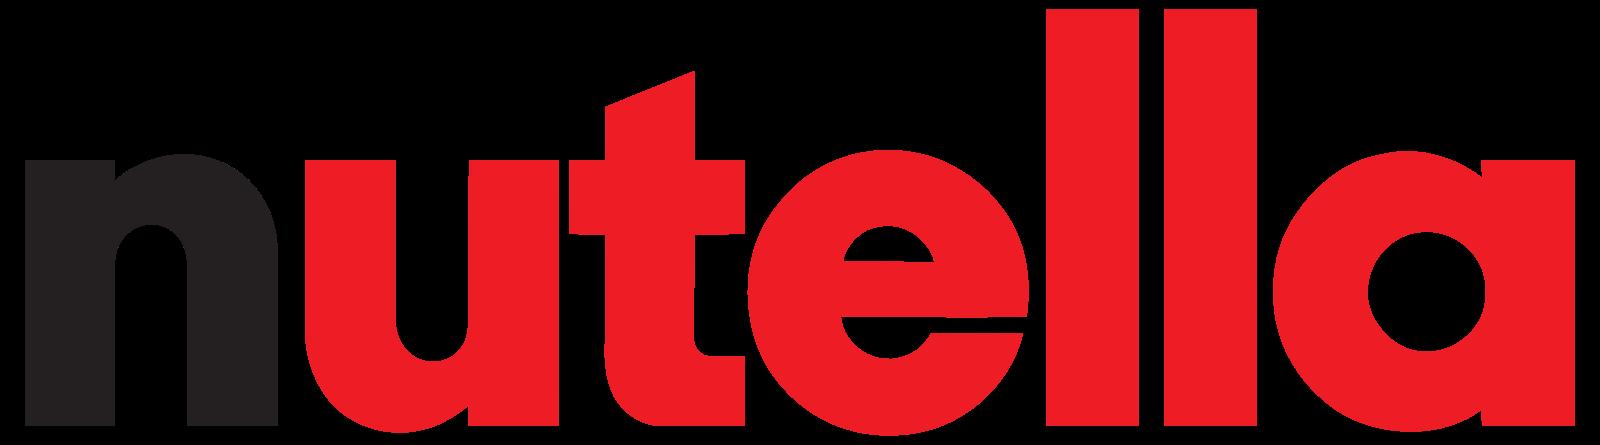 Nutella Logo | Logos | Pinterest | Nutella, Logos and Food ...